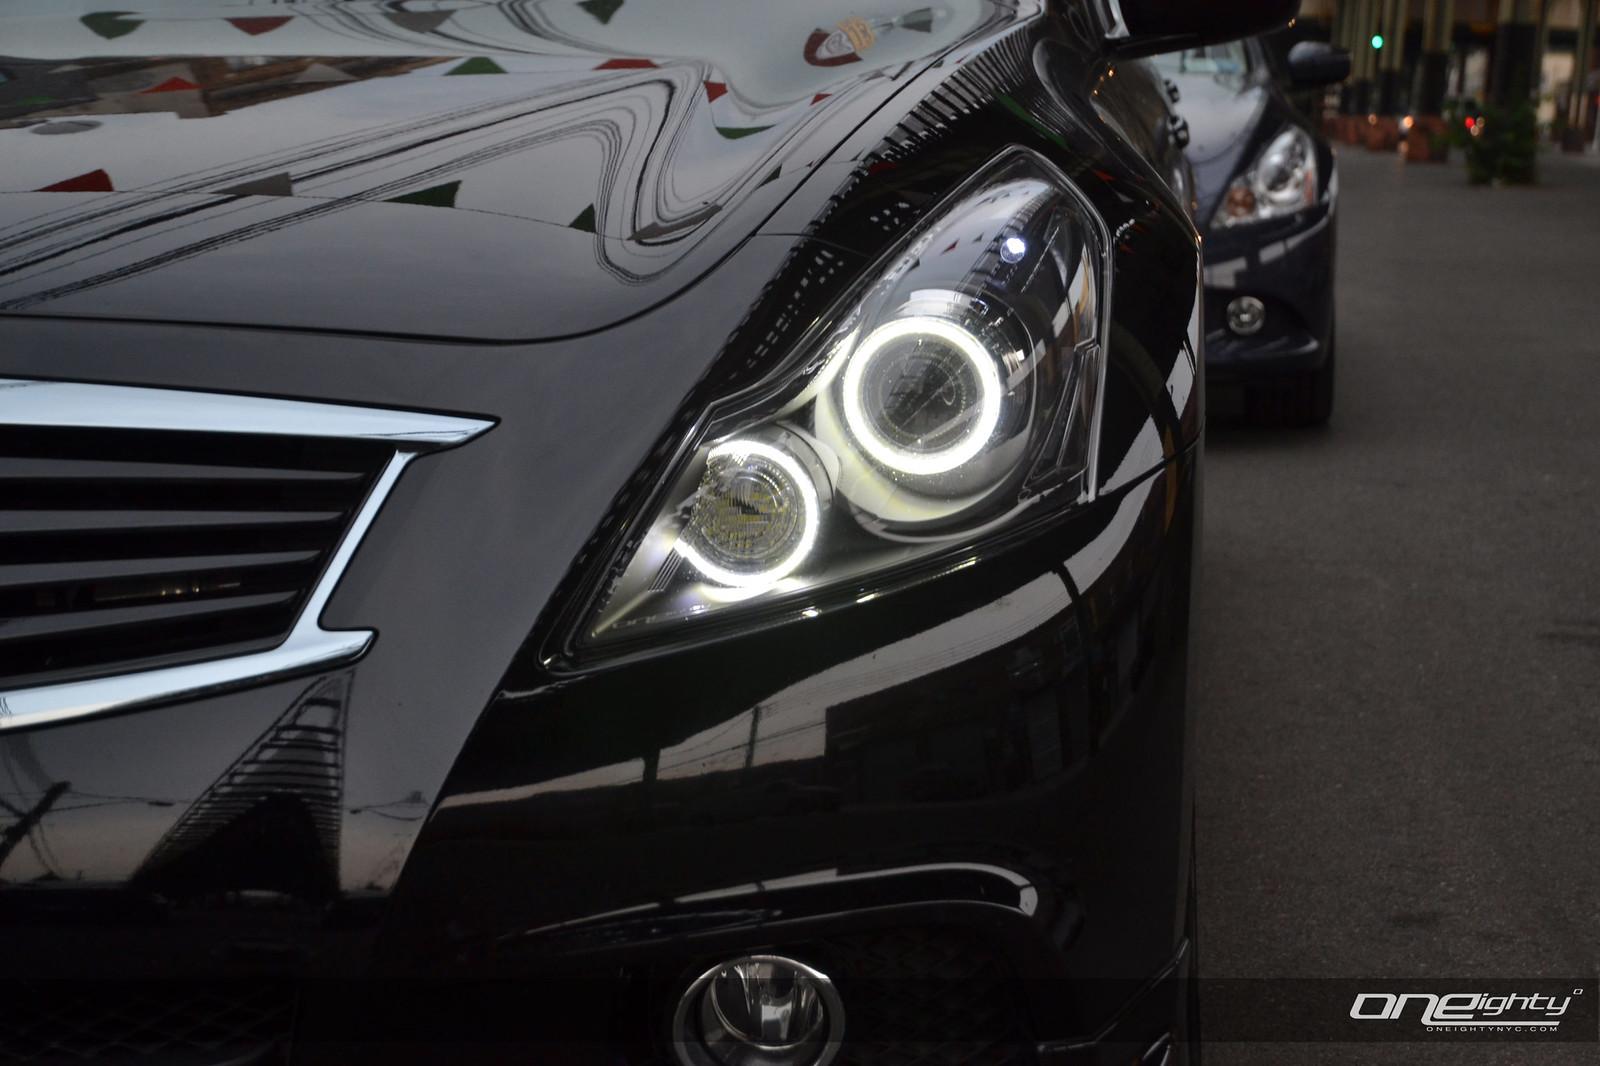 Vendor ONEighty G37 SEDAN custom headlight modification ...